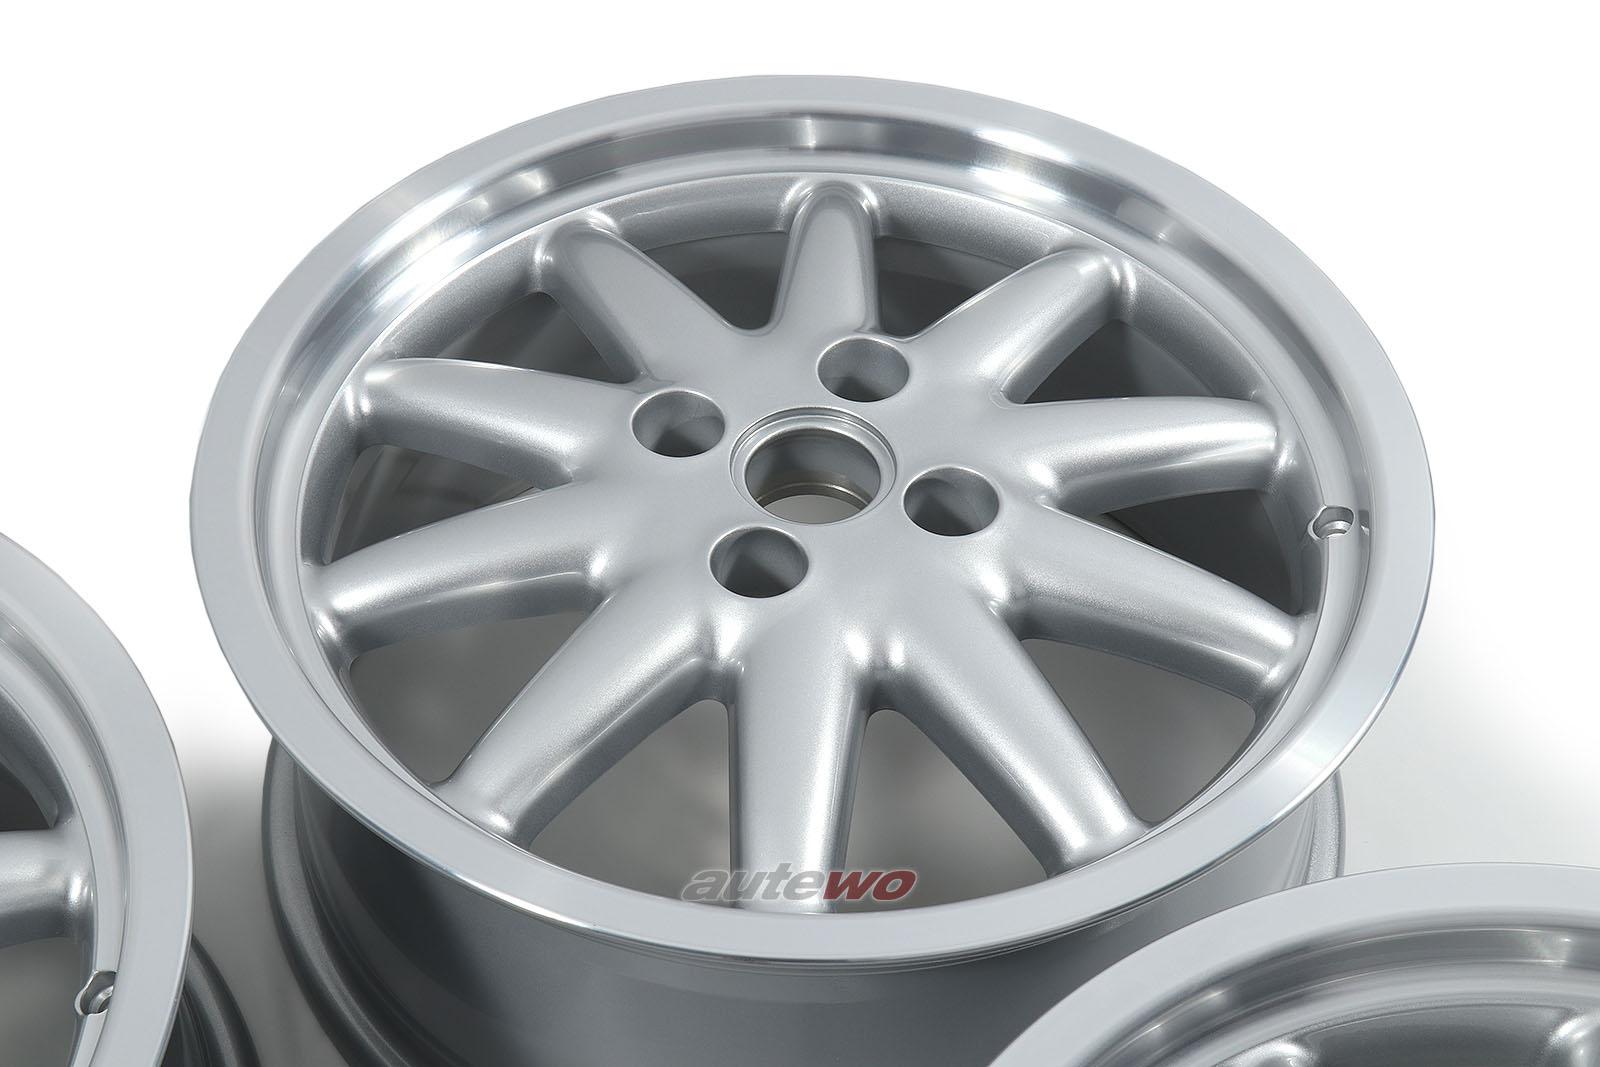 8G0601025B NEU Audi 80 B4/Coupe/Cabrio 10-Speichen-BOLERO-Felgen 7x17 4x108